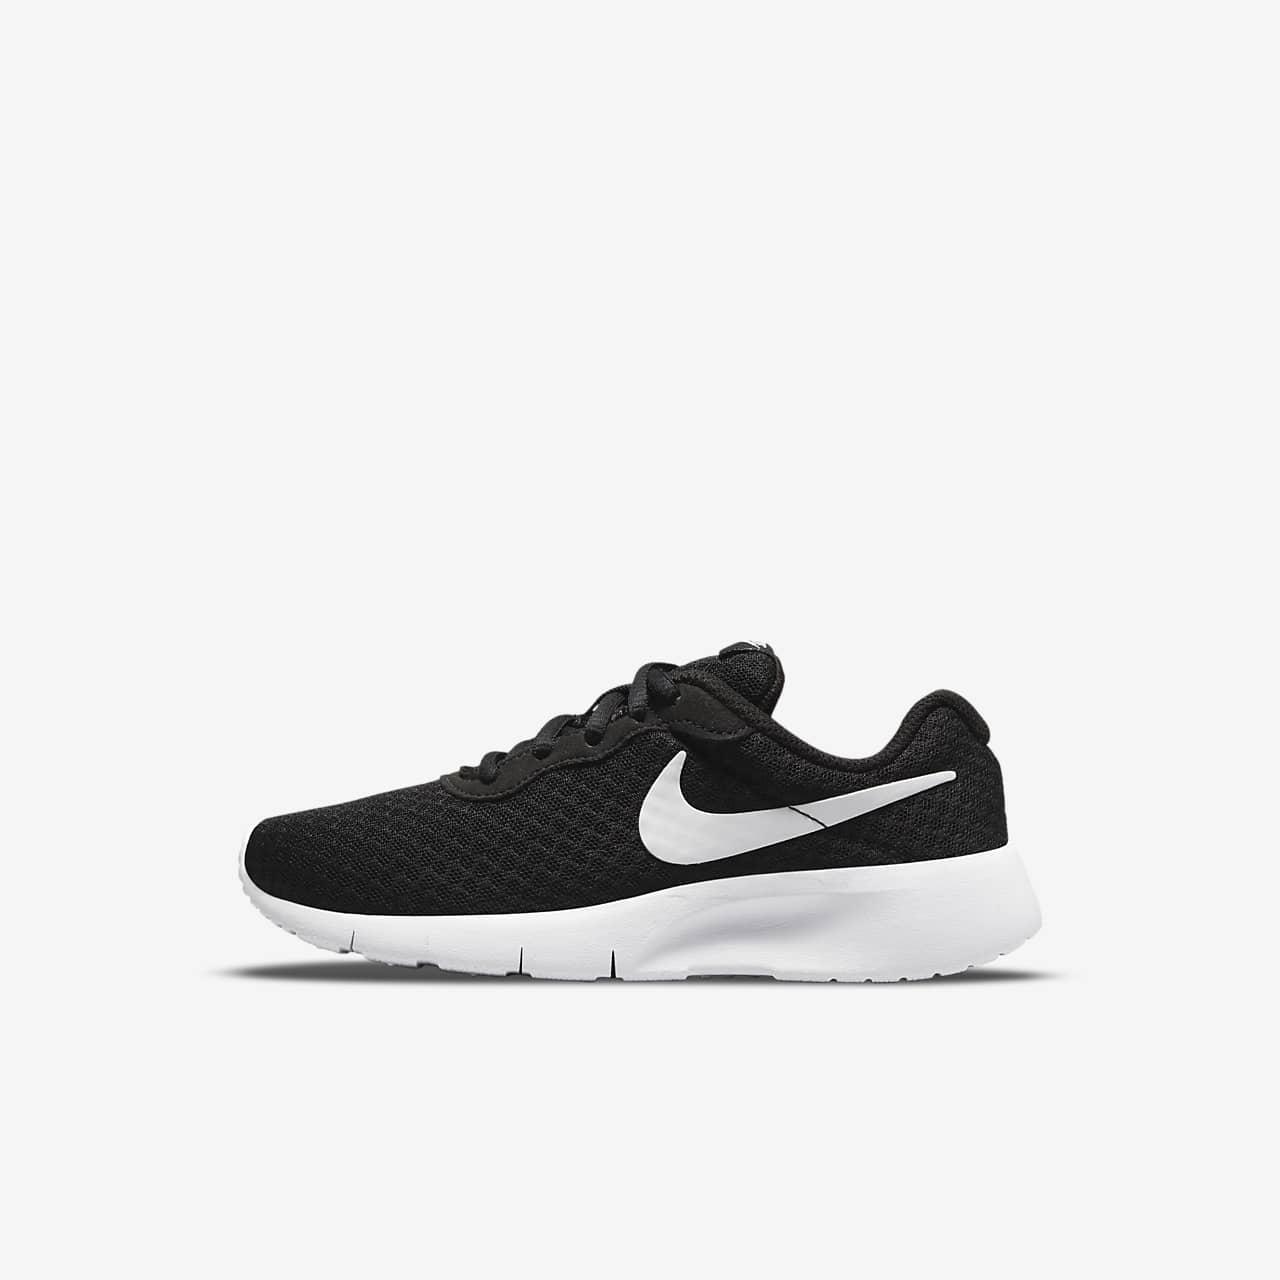 Chaussure Nike Tanjun pour Jeune enfant